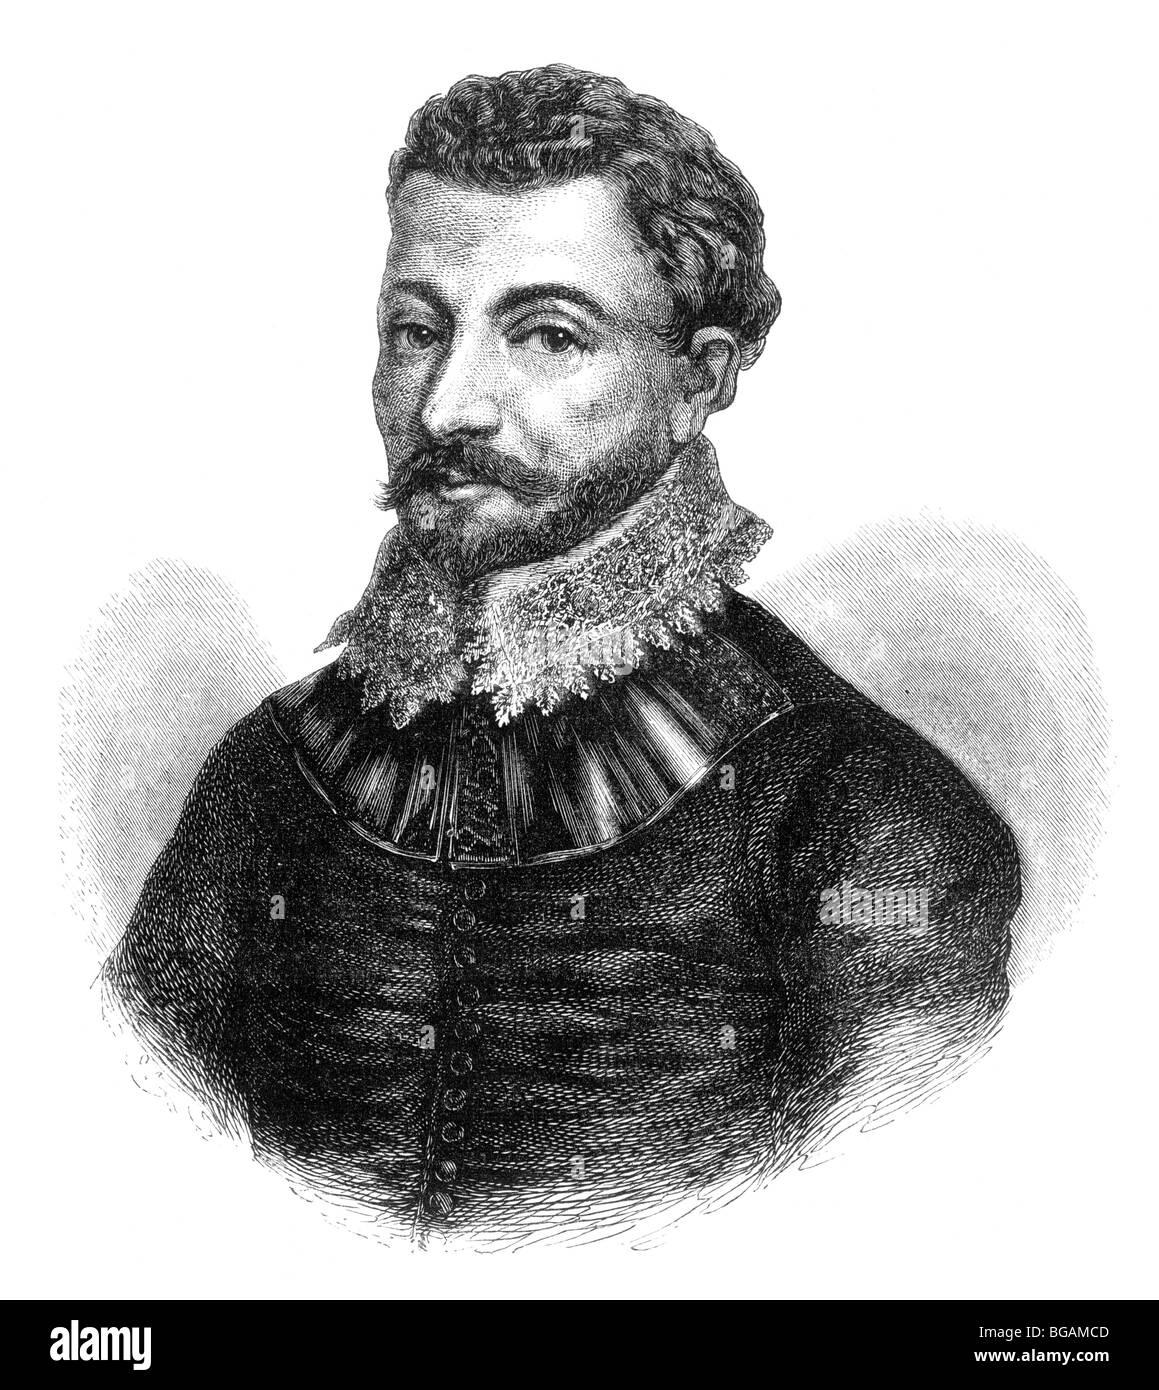 Illustration portrait of sir francis drake stock image